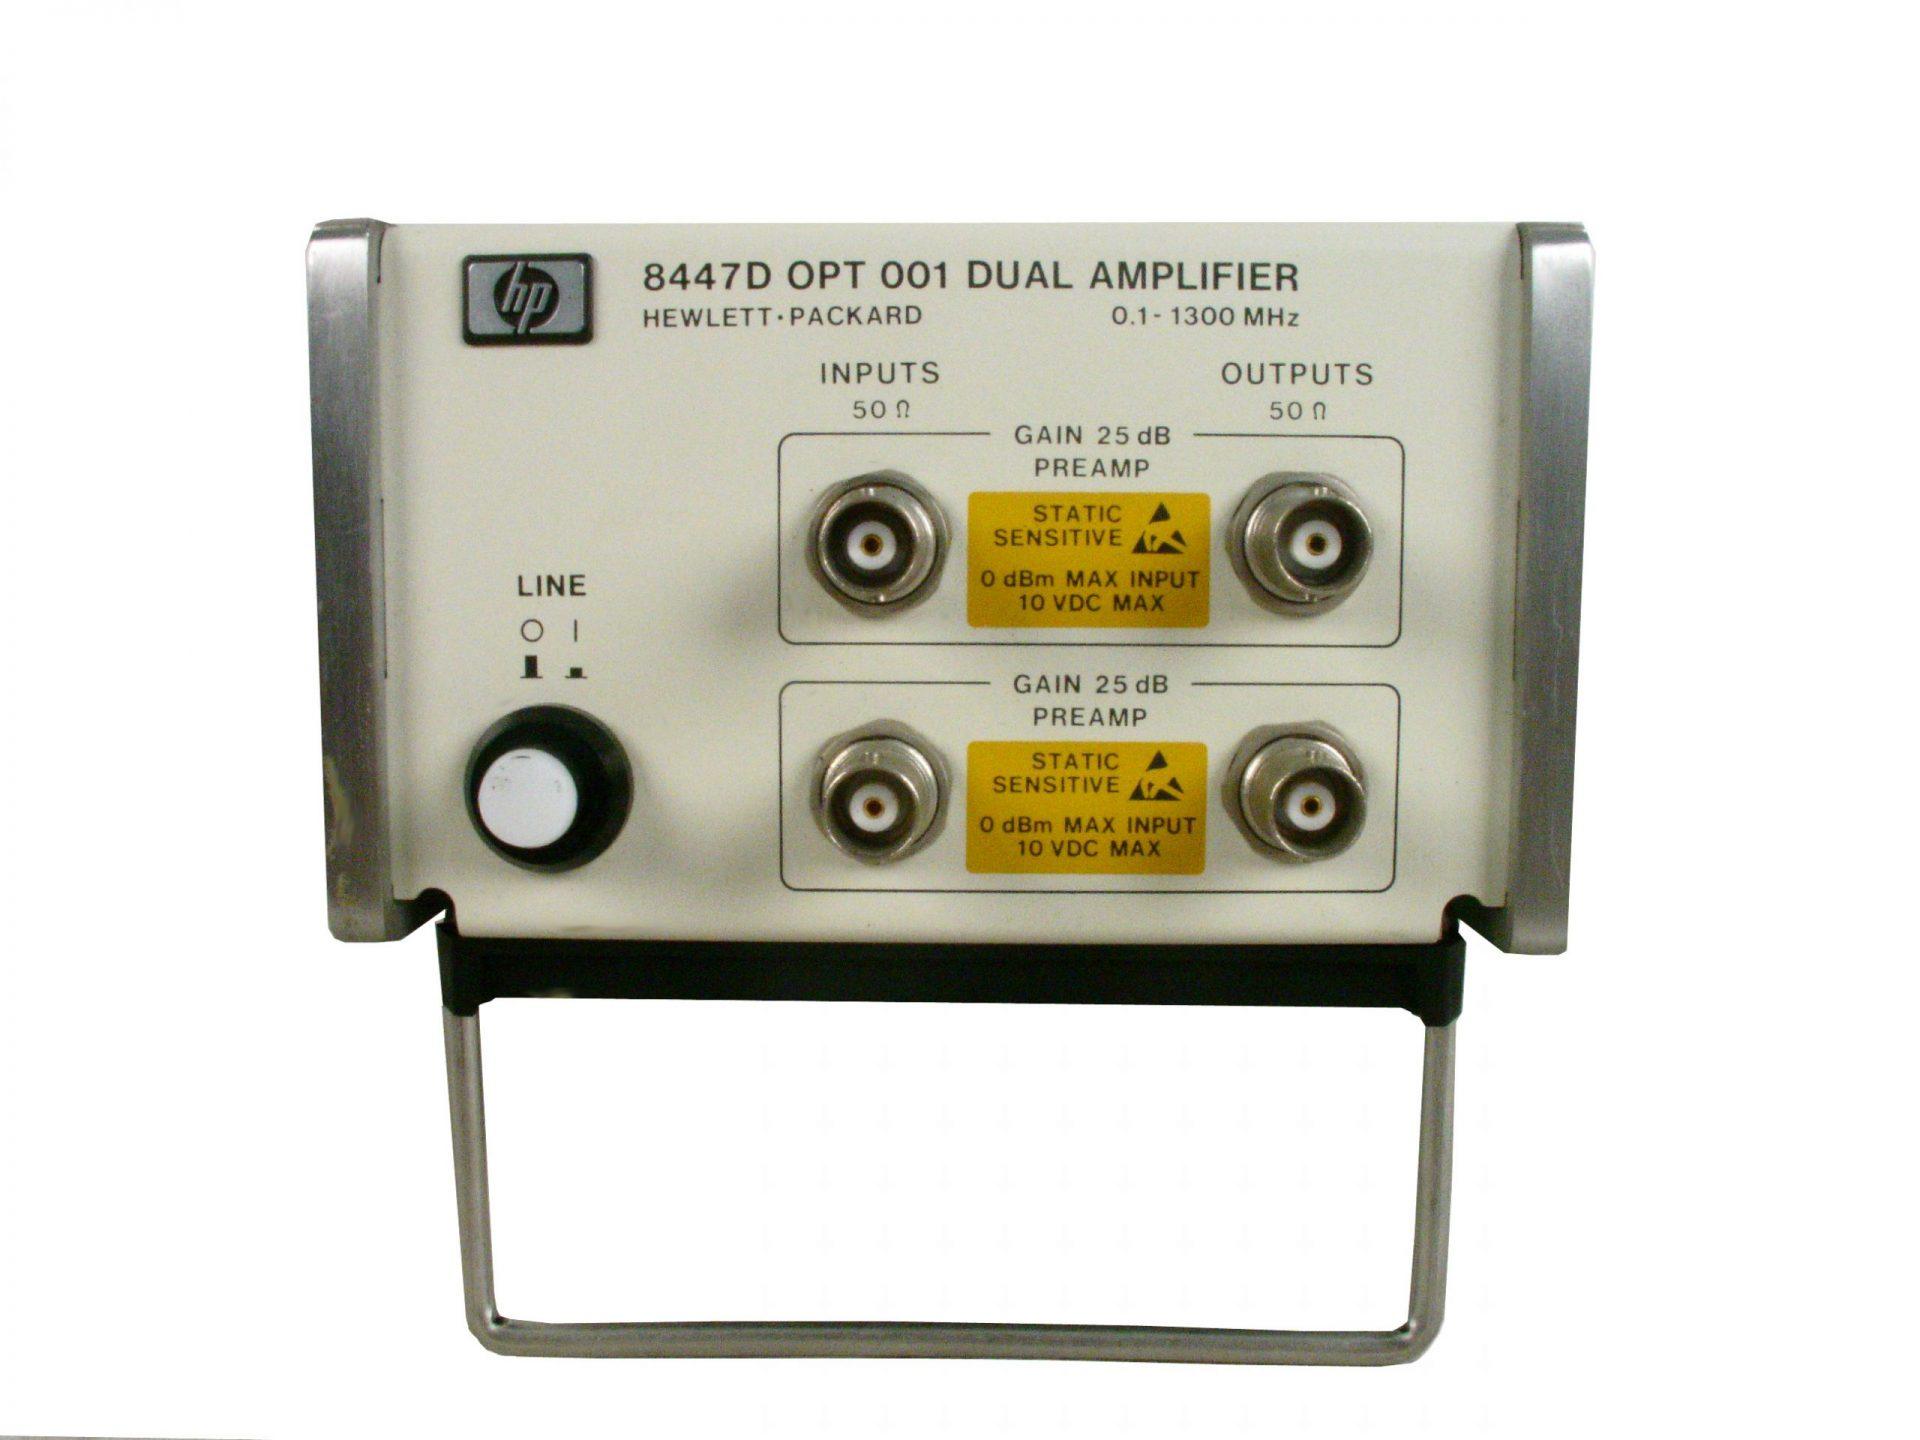 Agilent 8447A Amplifier